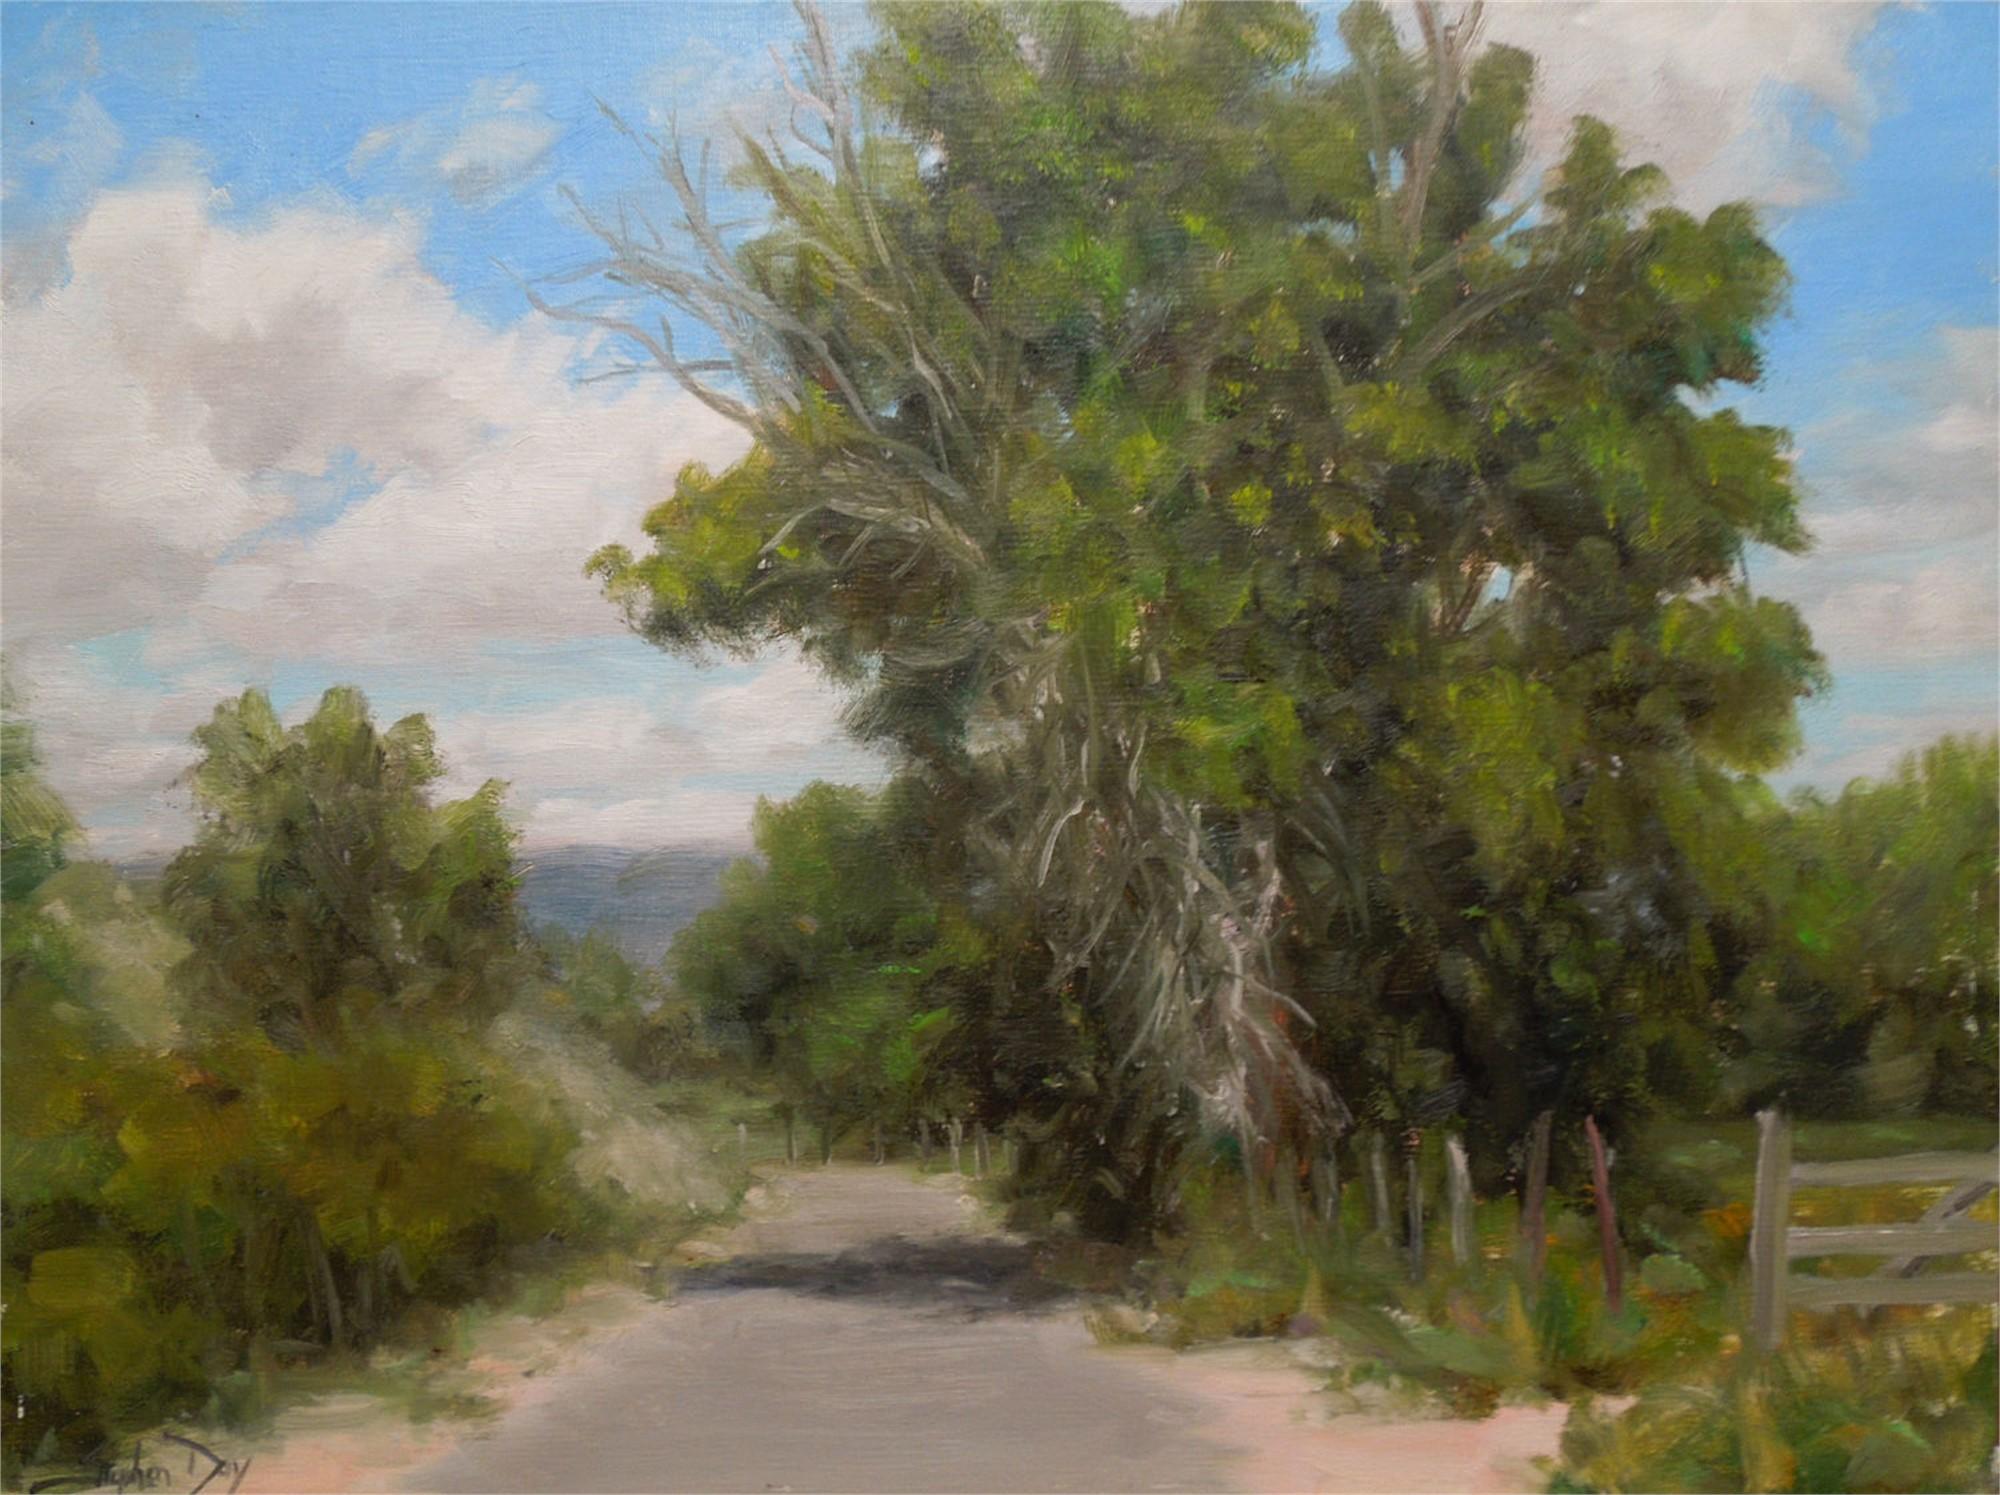 Roadside Cottonwoods by Stephen Day